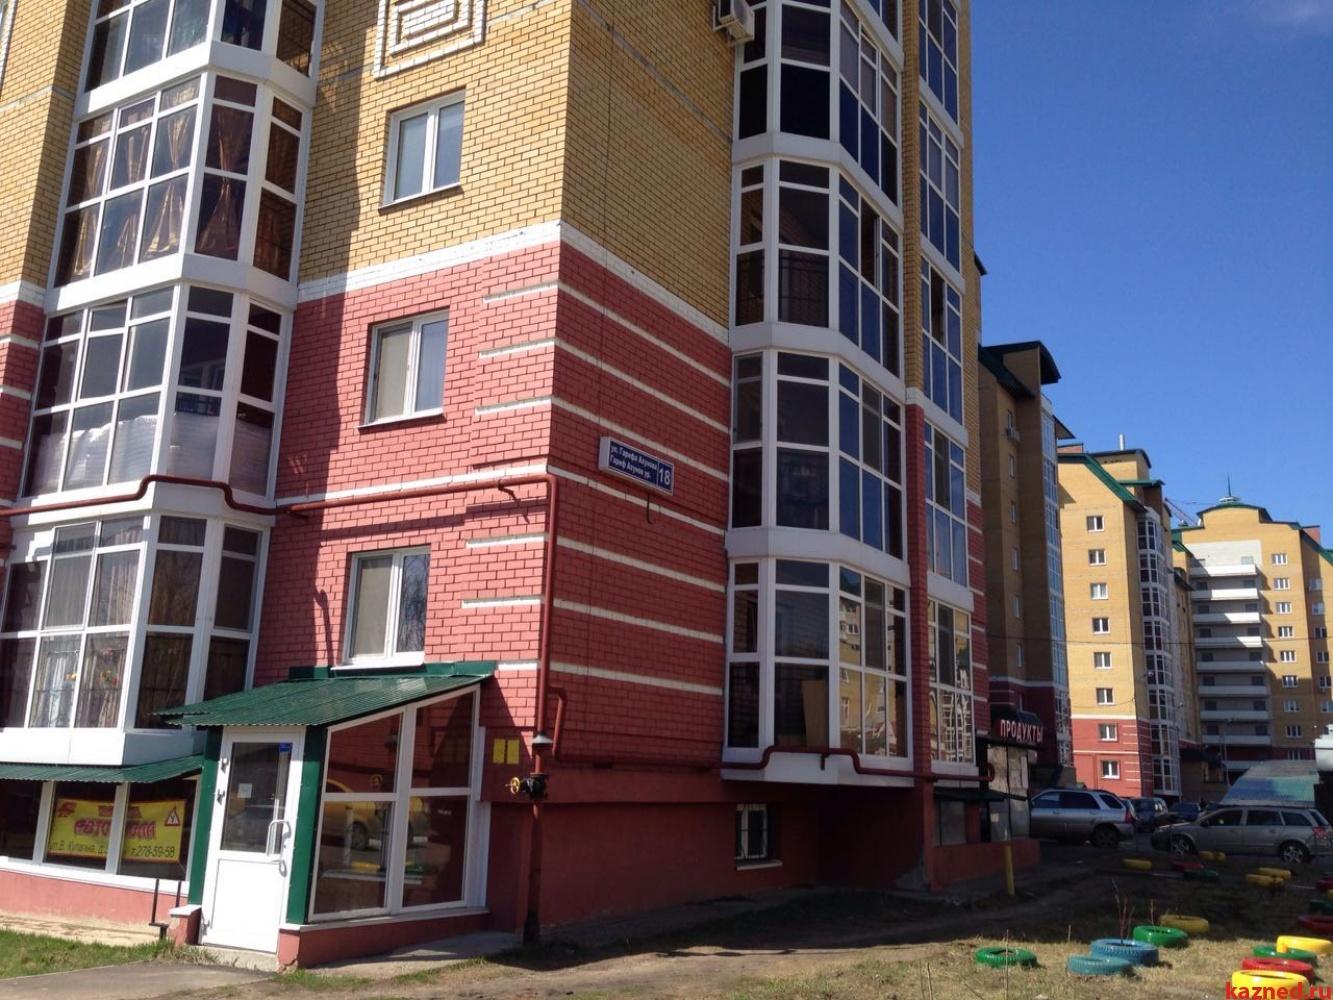 Продажа 3-к квартиры Гарифа Ахунова, 18, 88 м²  (миниатюра №1)